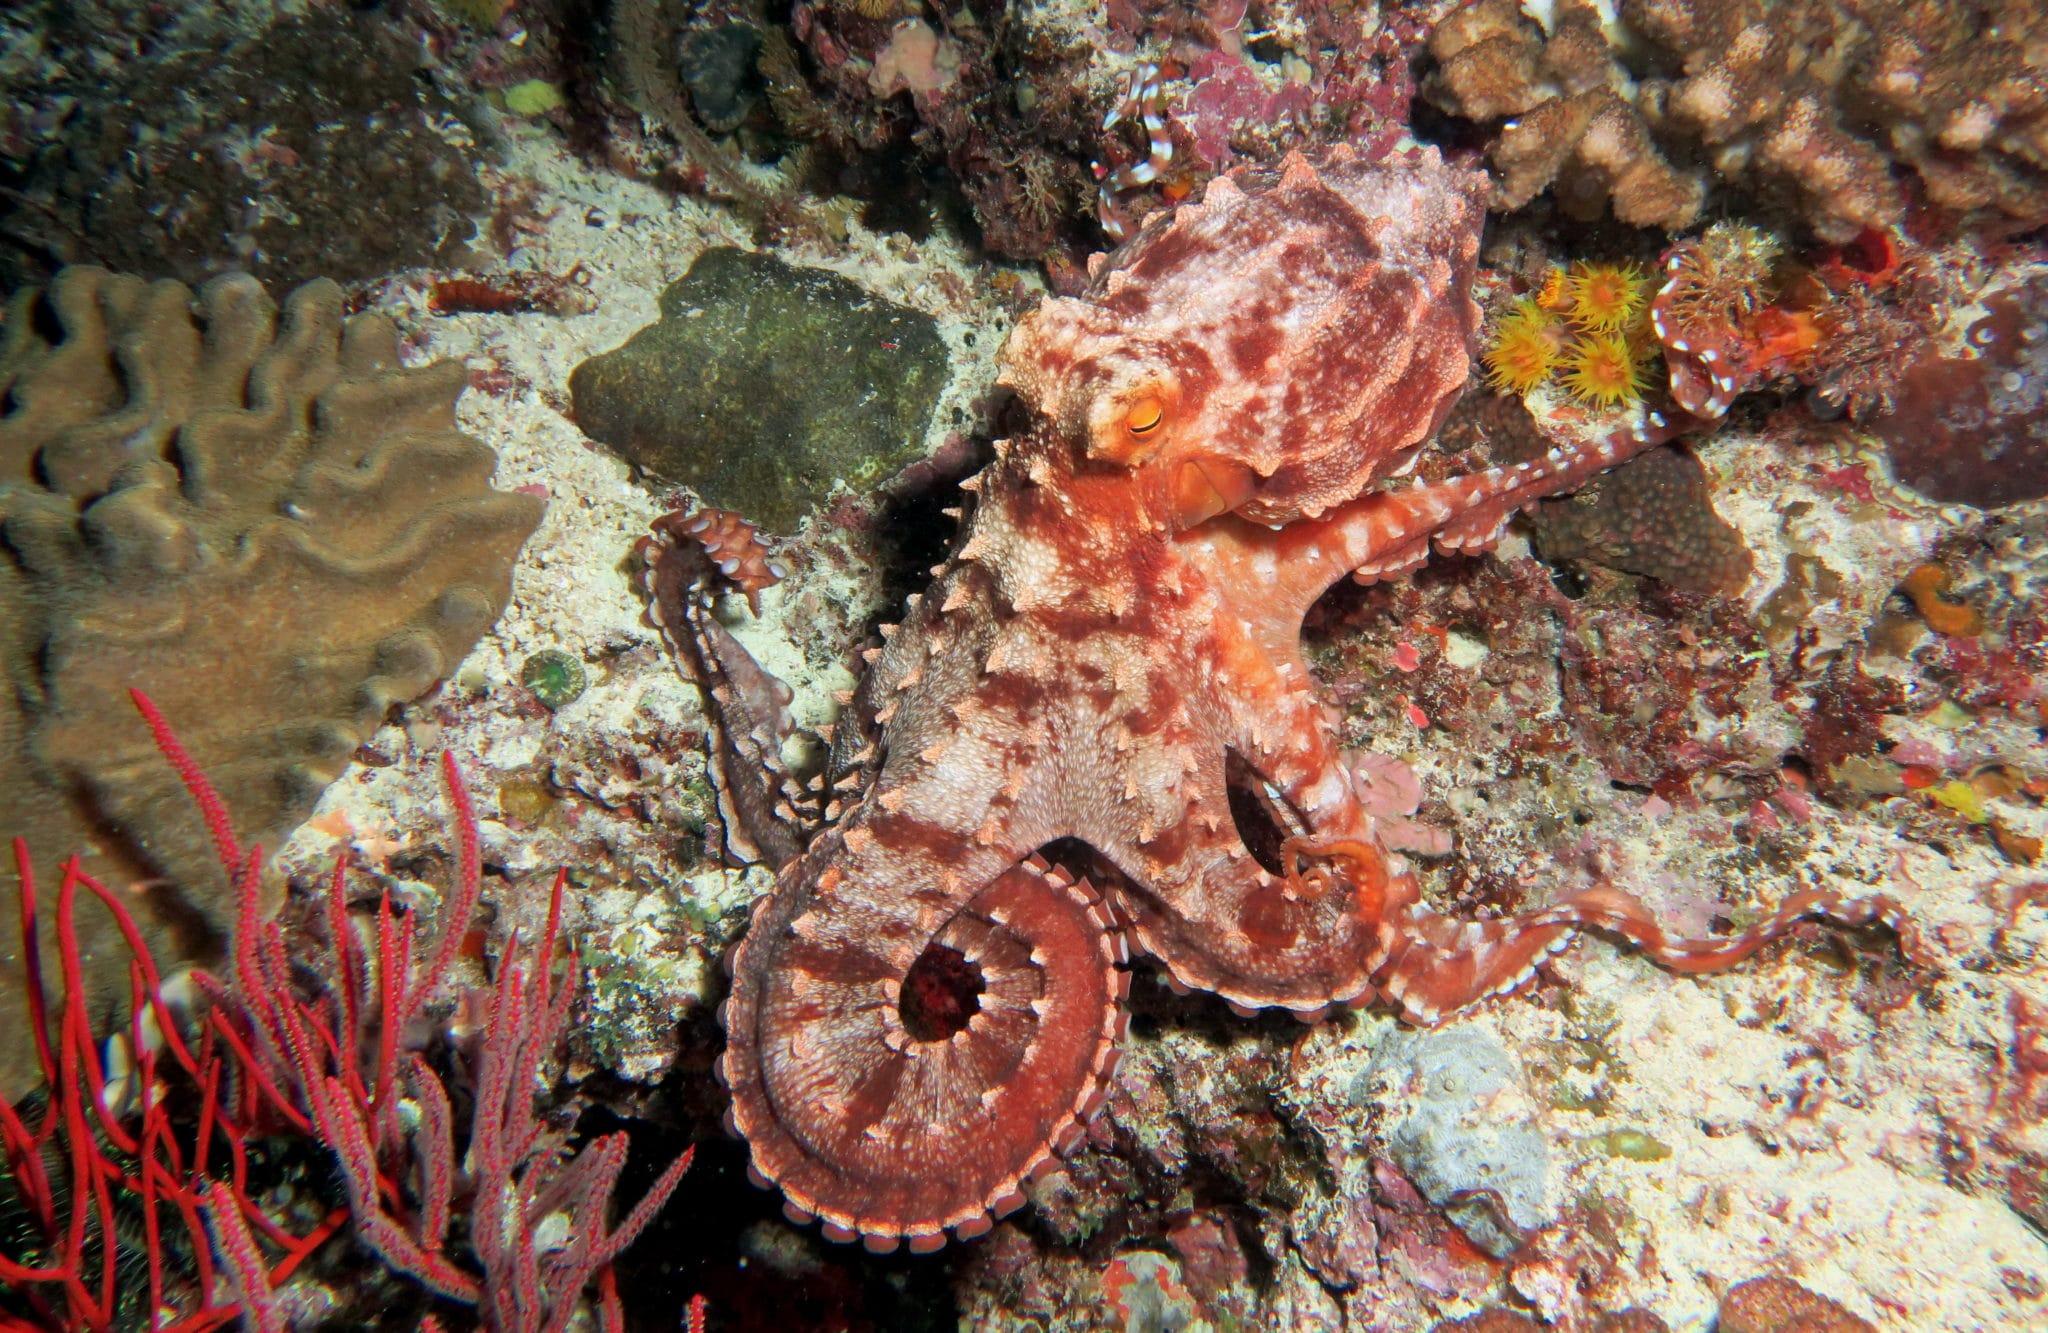 Octopus scuba diving Isle of Pines New Caledonia